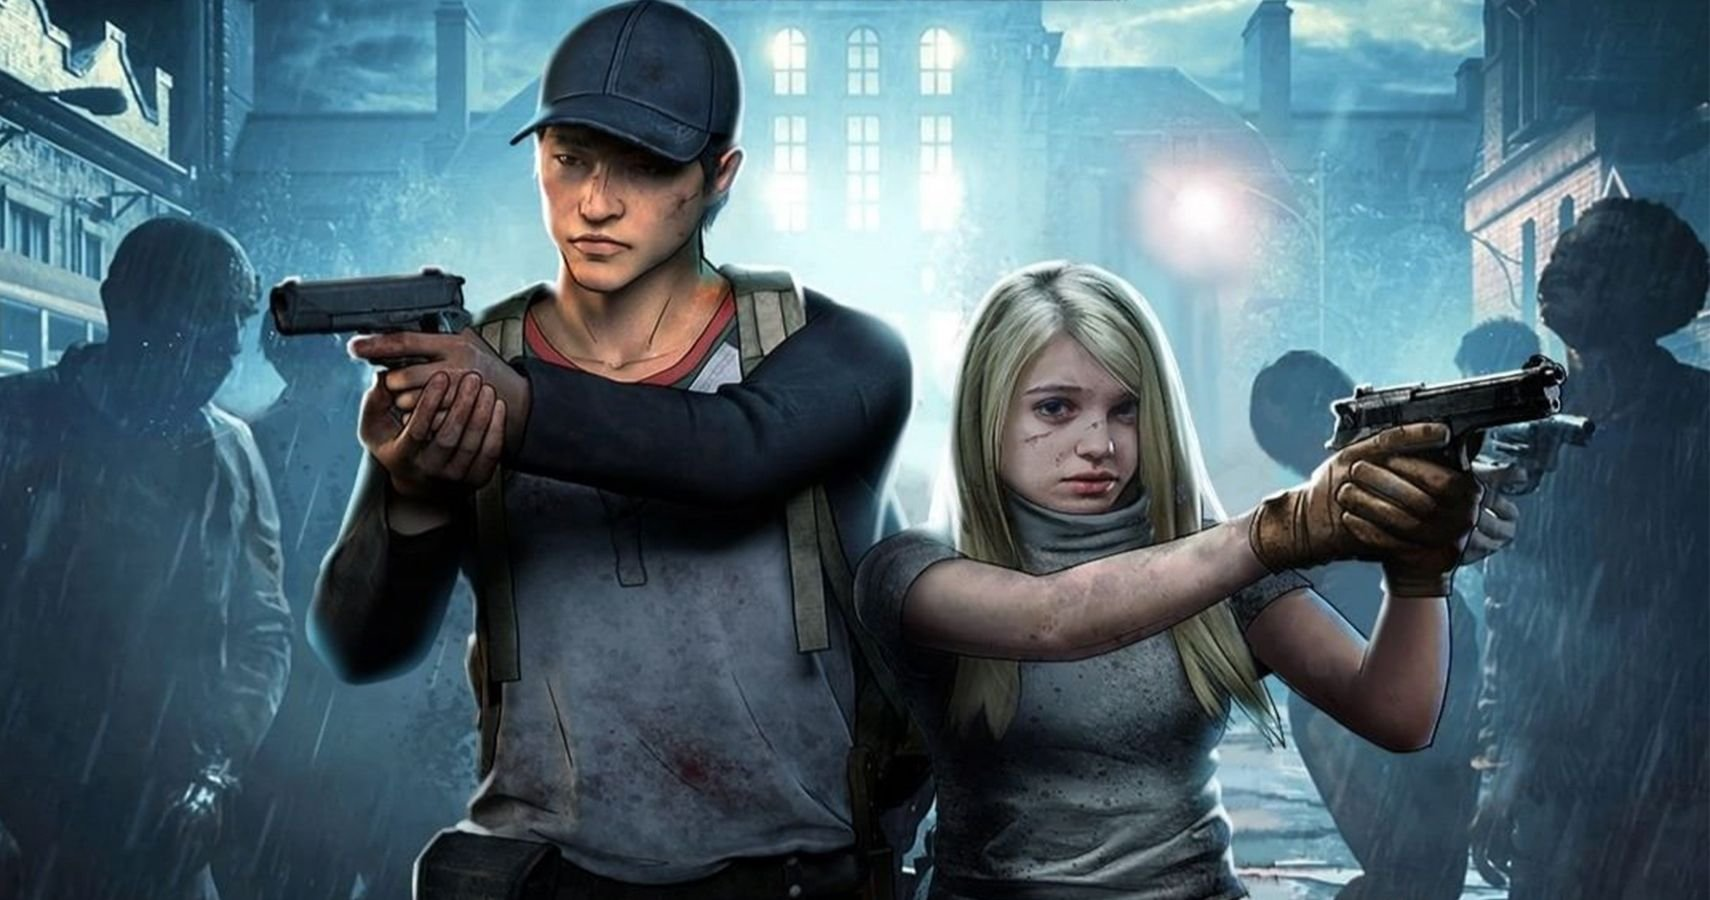 The Walking Dead Survivors Copy Resident Evil Artwork